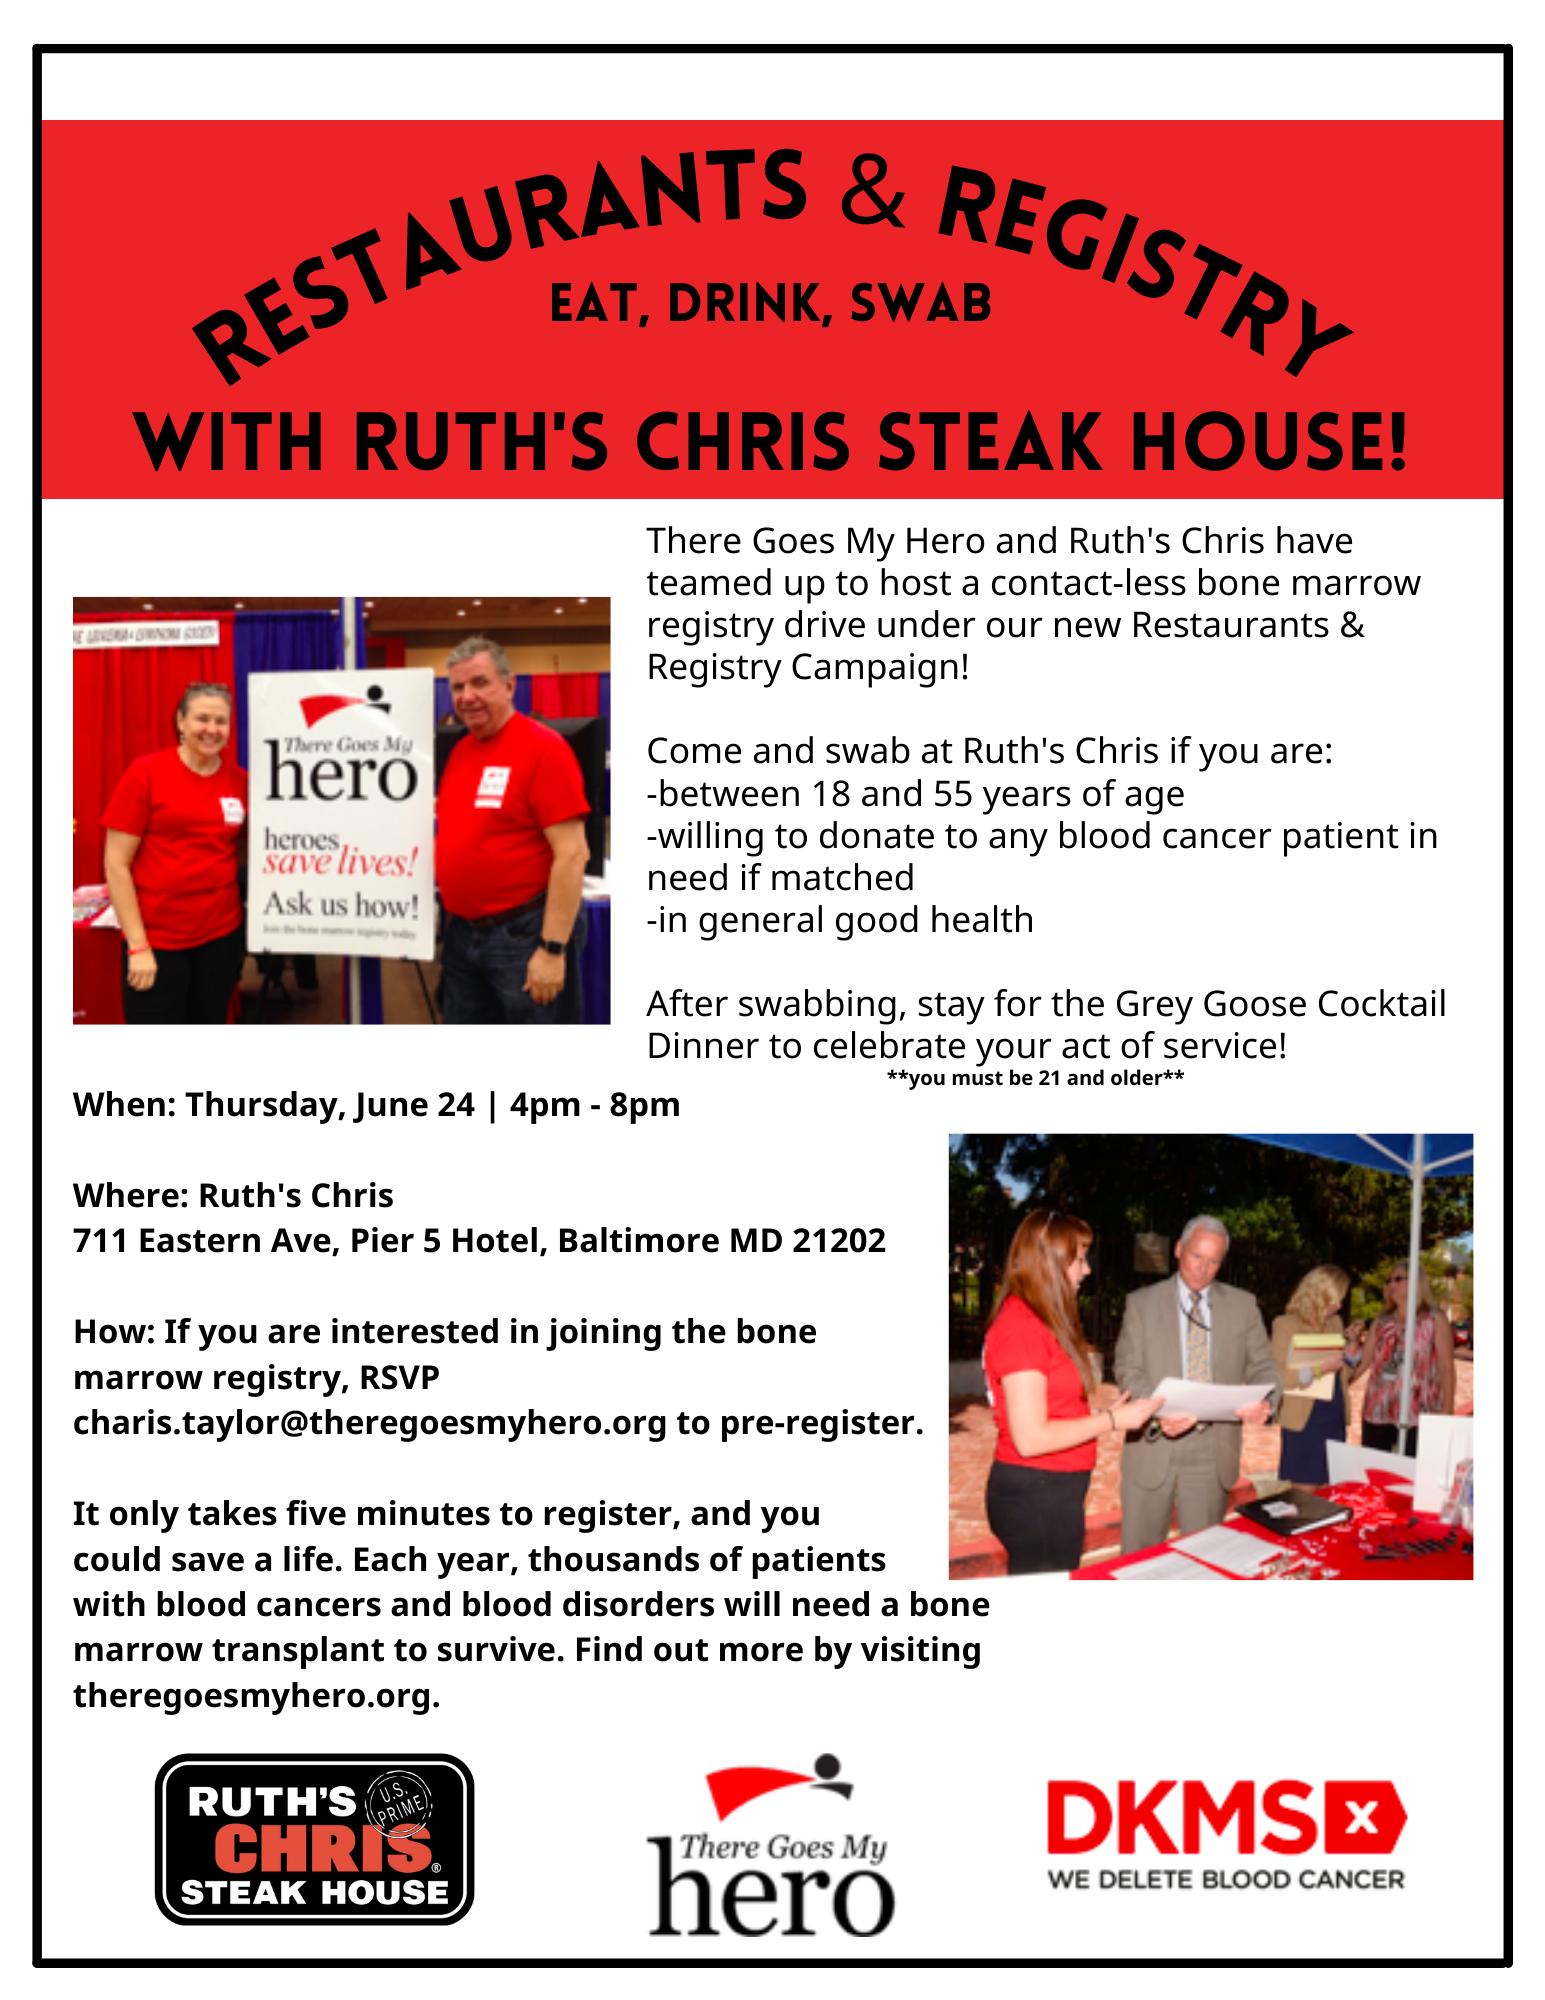 Ruth's Chris Bone Marrow Registry Drive